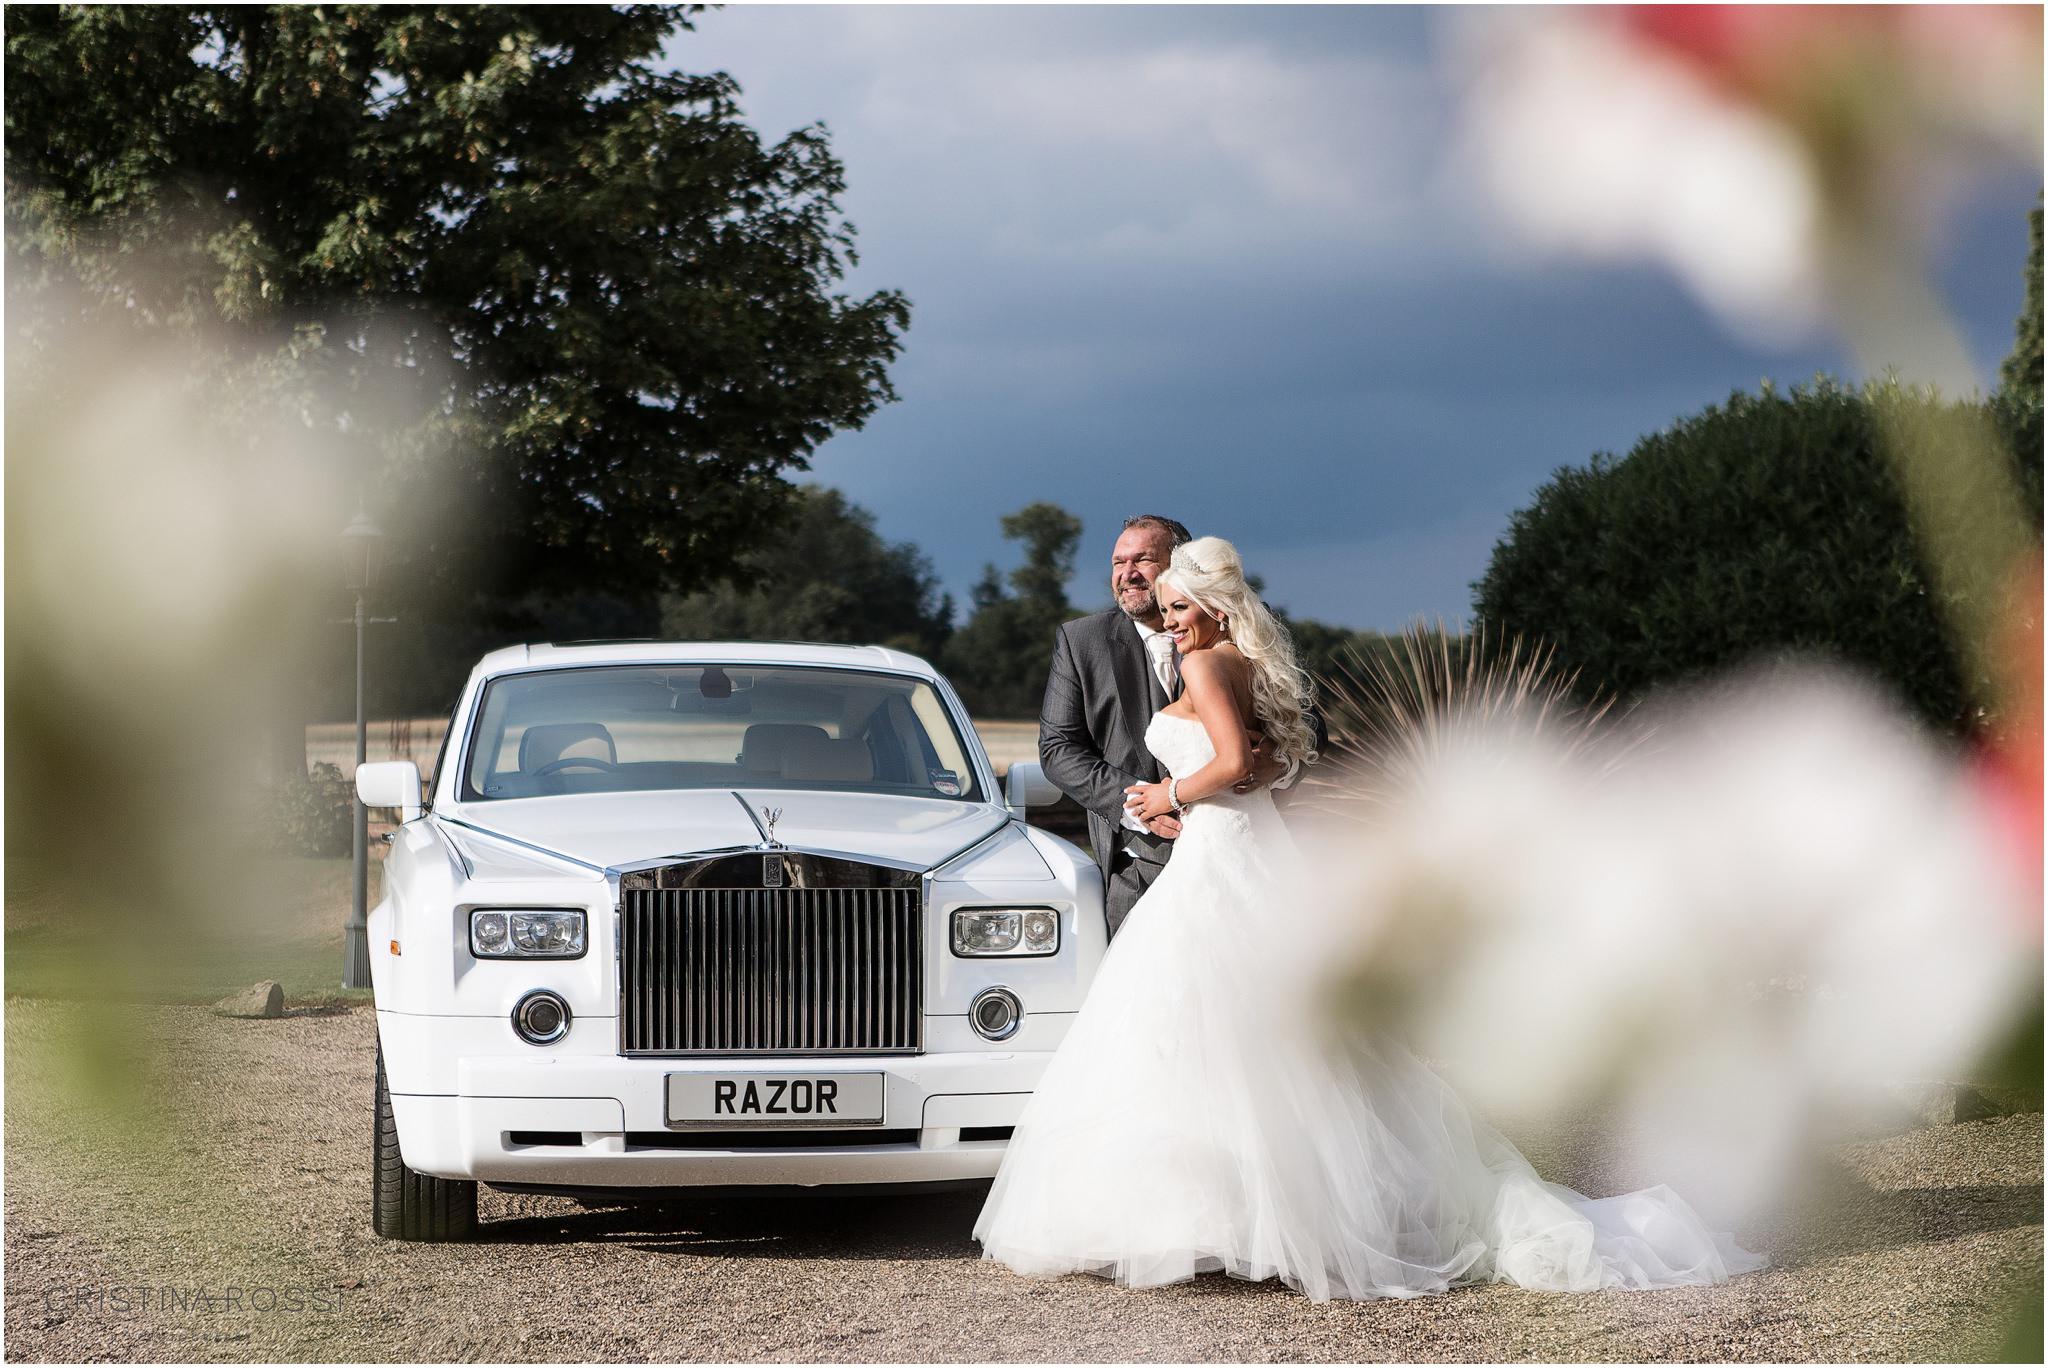 Eastwell Manor Neil Razor Ruddock & Leah Newman wedding_0098